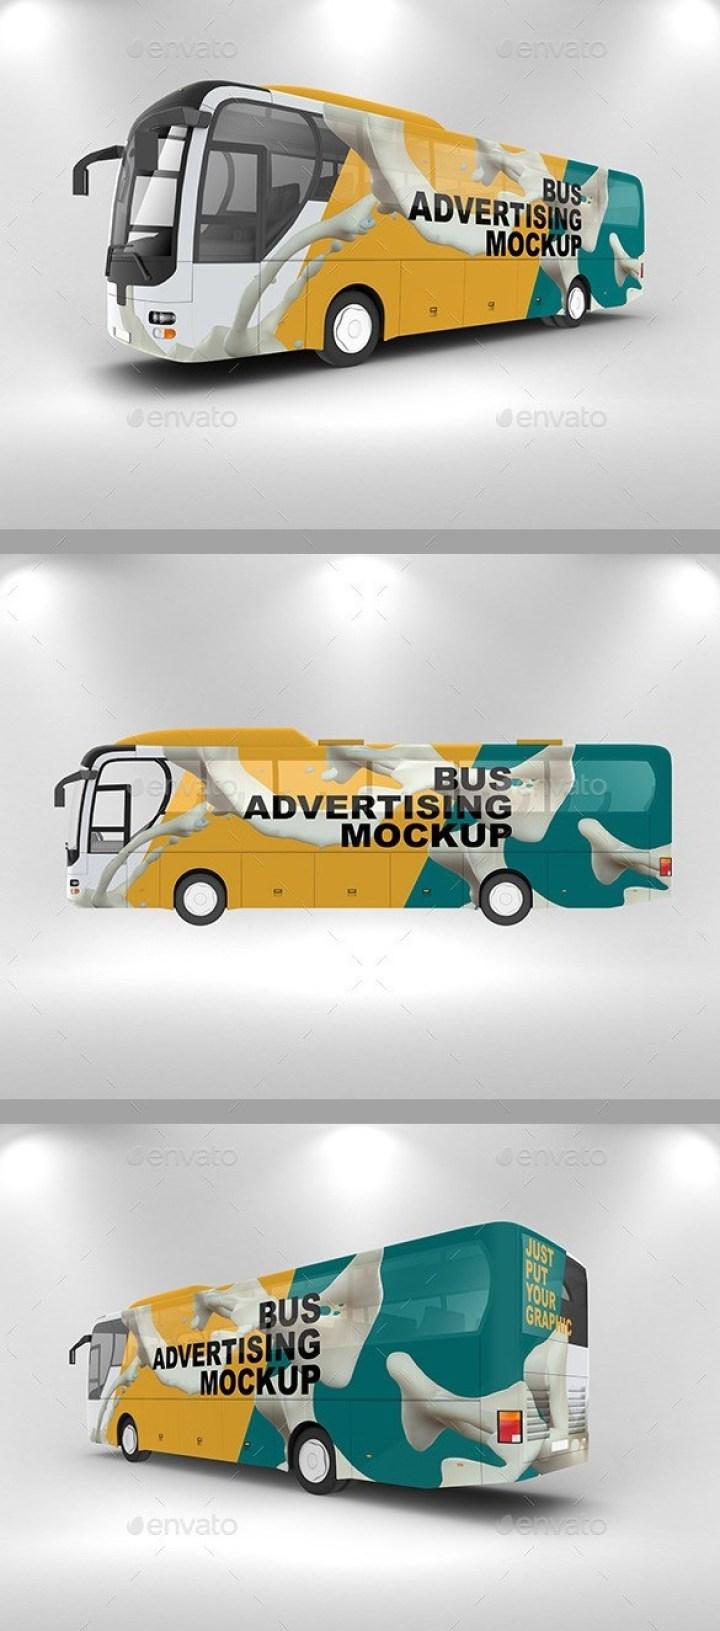 Bus Advertising Mockup